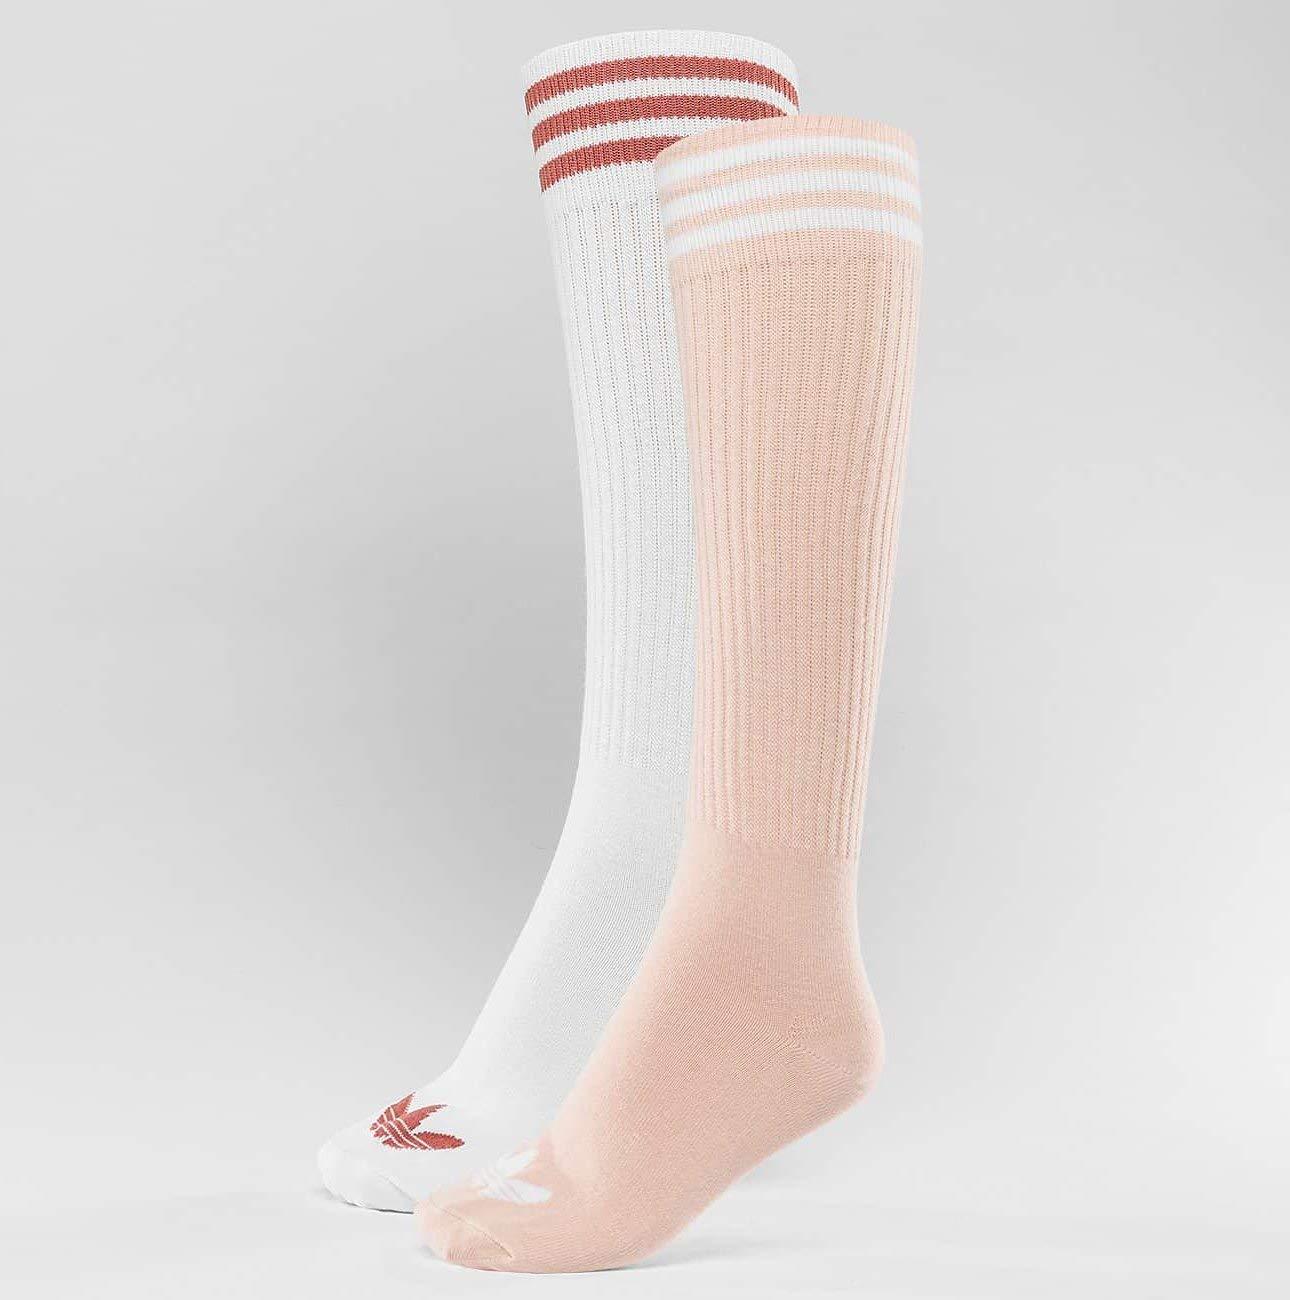 Adidas S Knee so 2Pp Calze, Unisex Bambini, CE5718, Nero (Nero/Bianco), 35/38